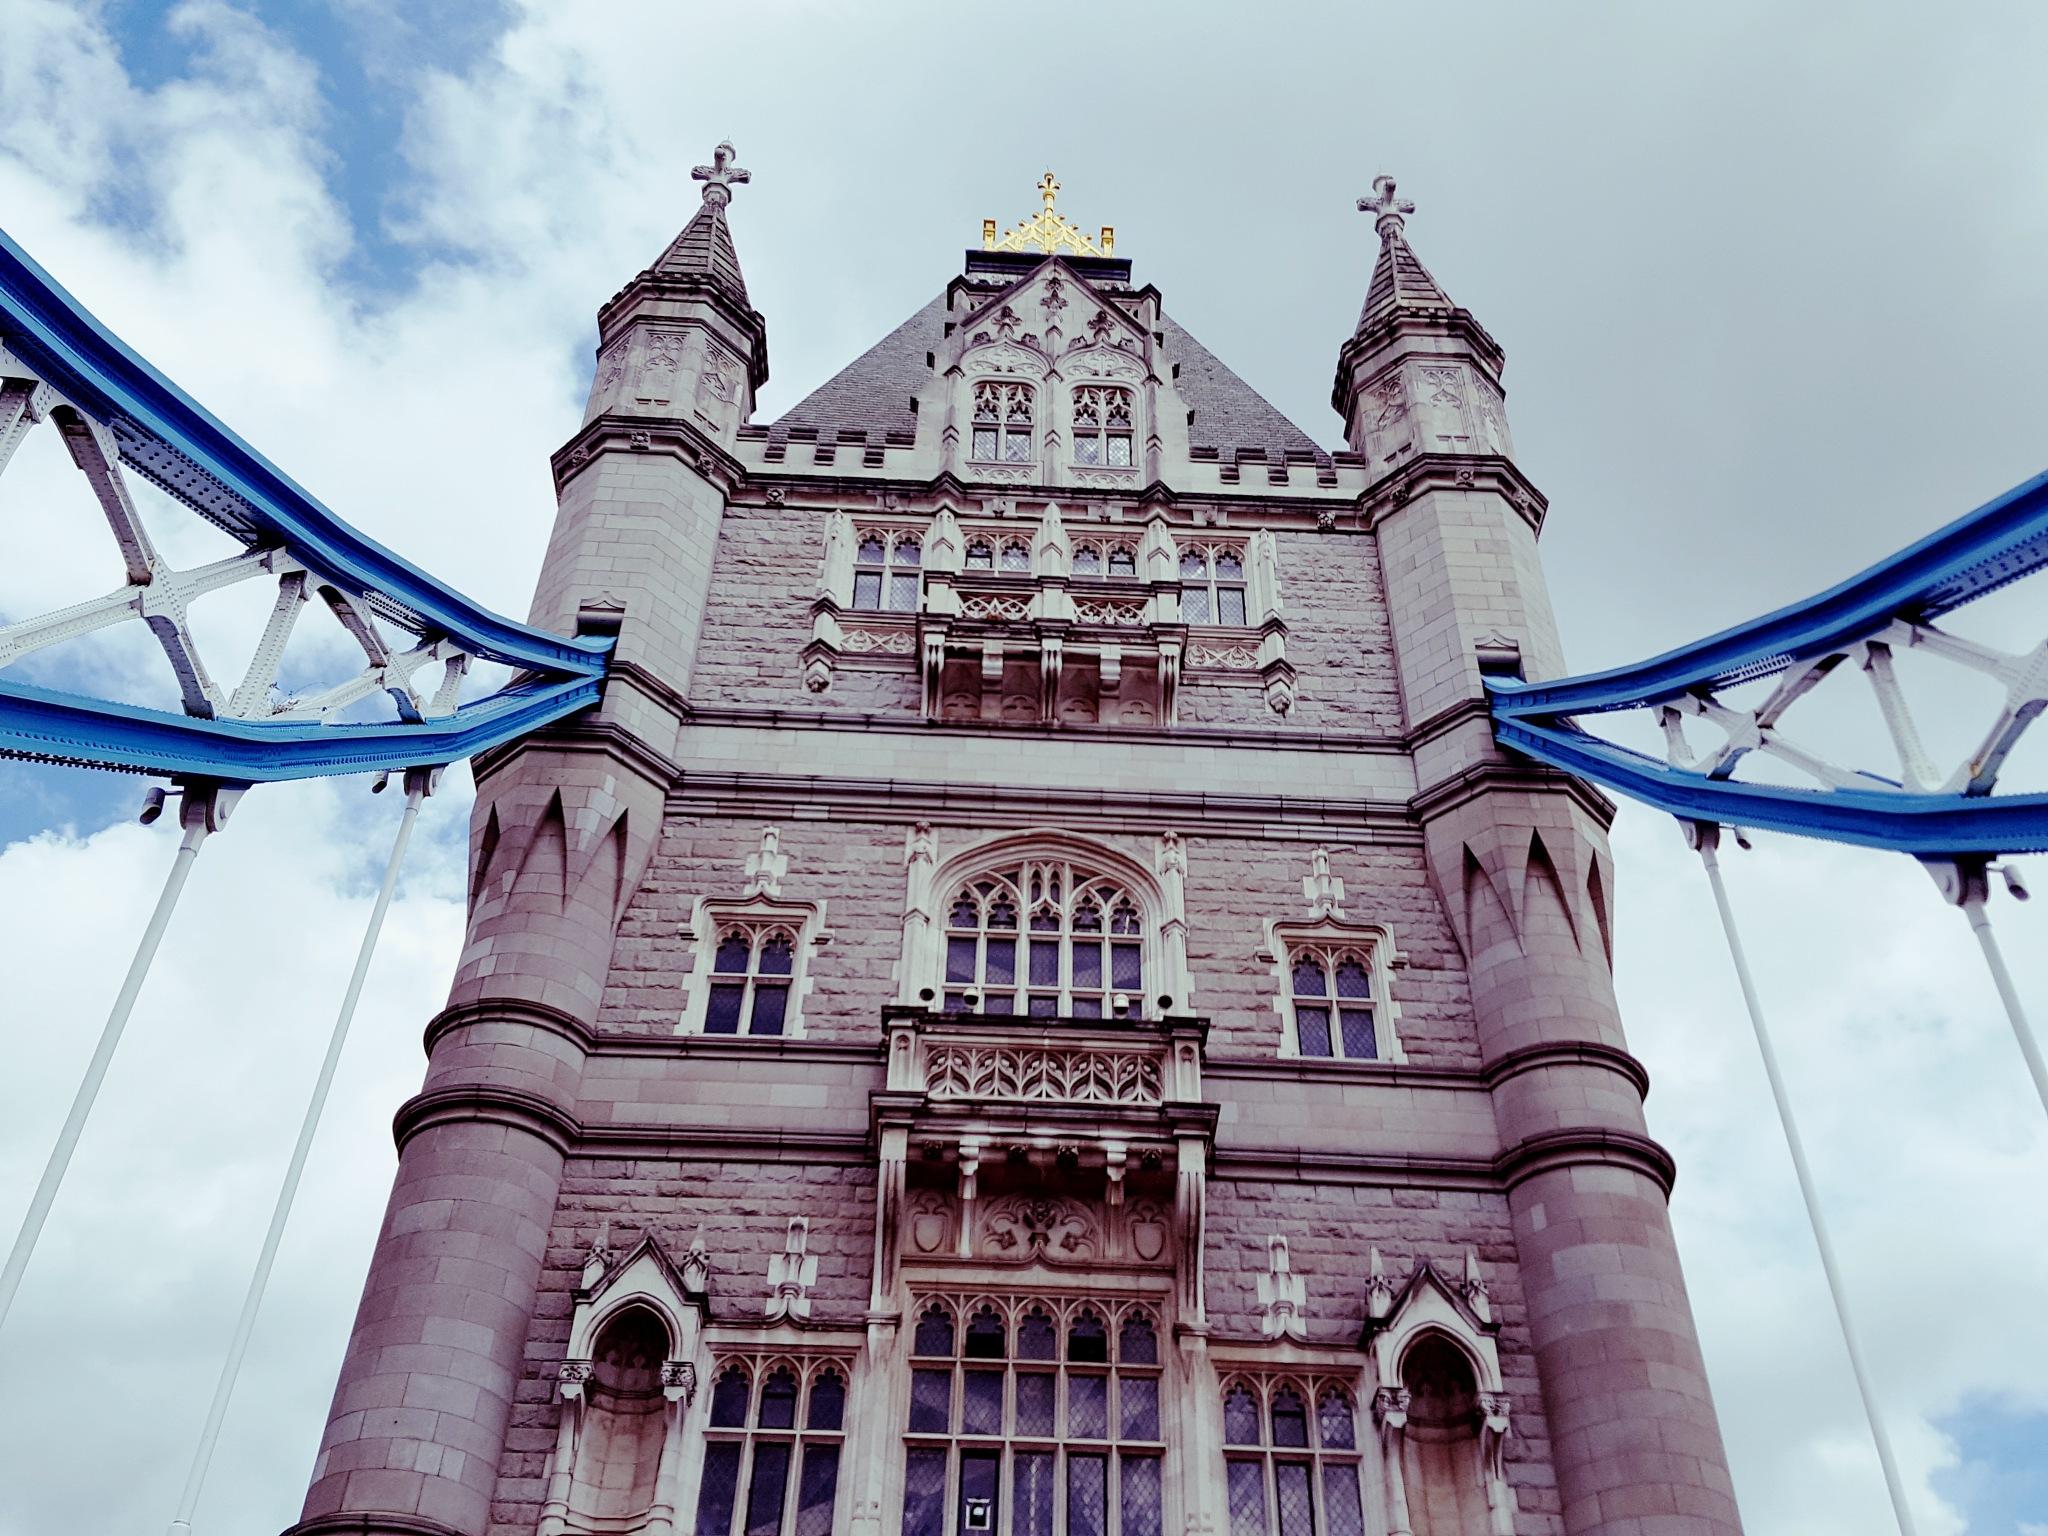 Tower Bridge by John Jack Dubajka